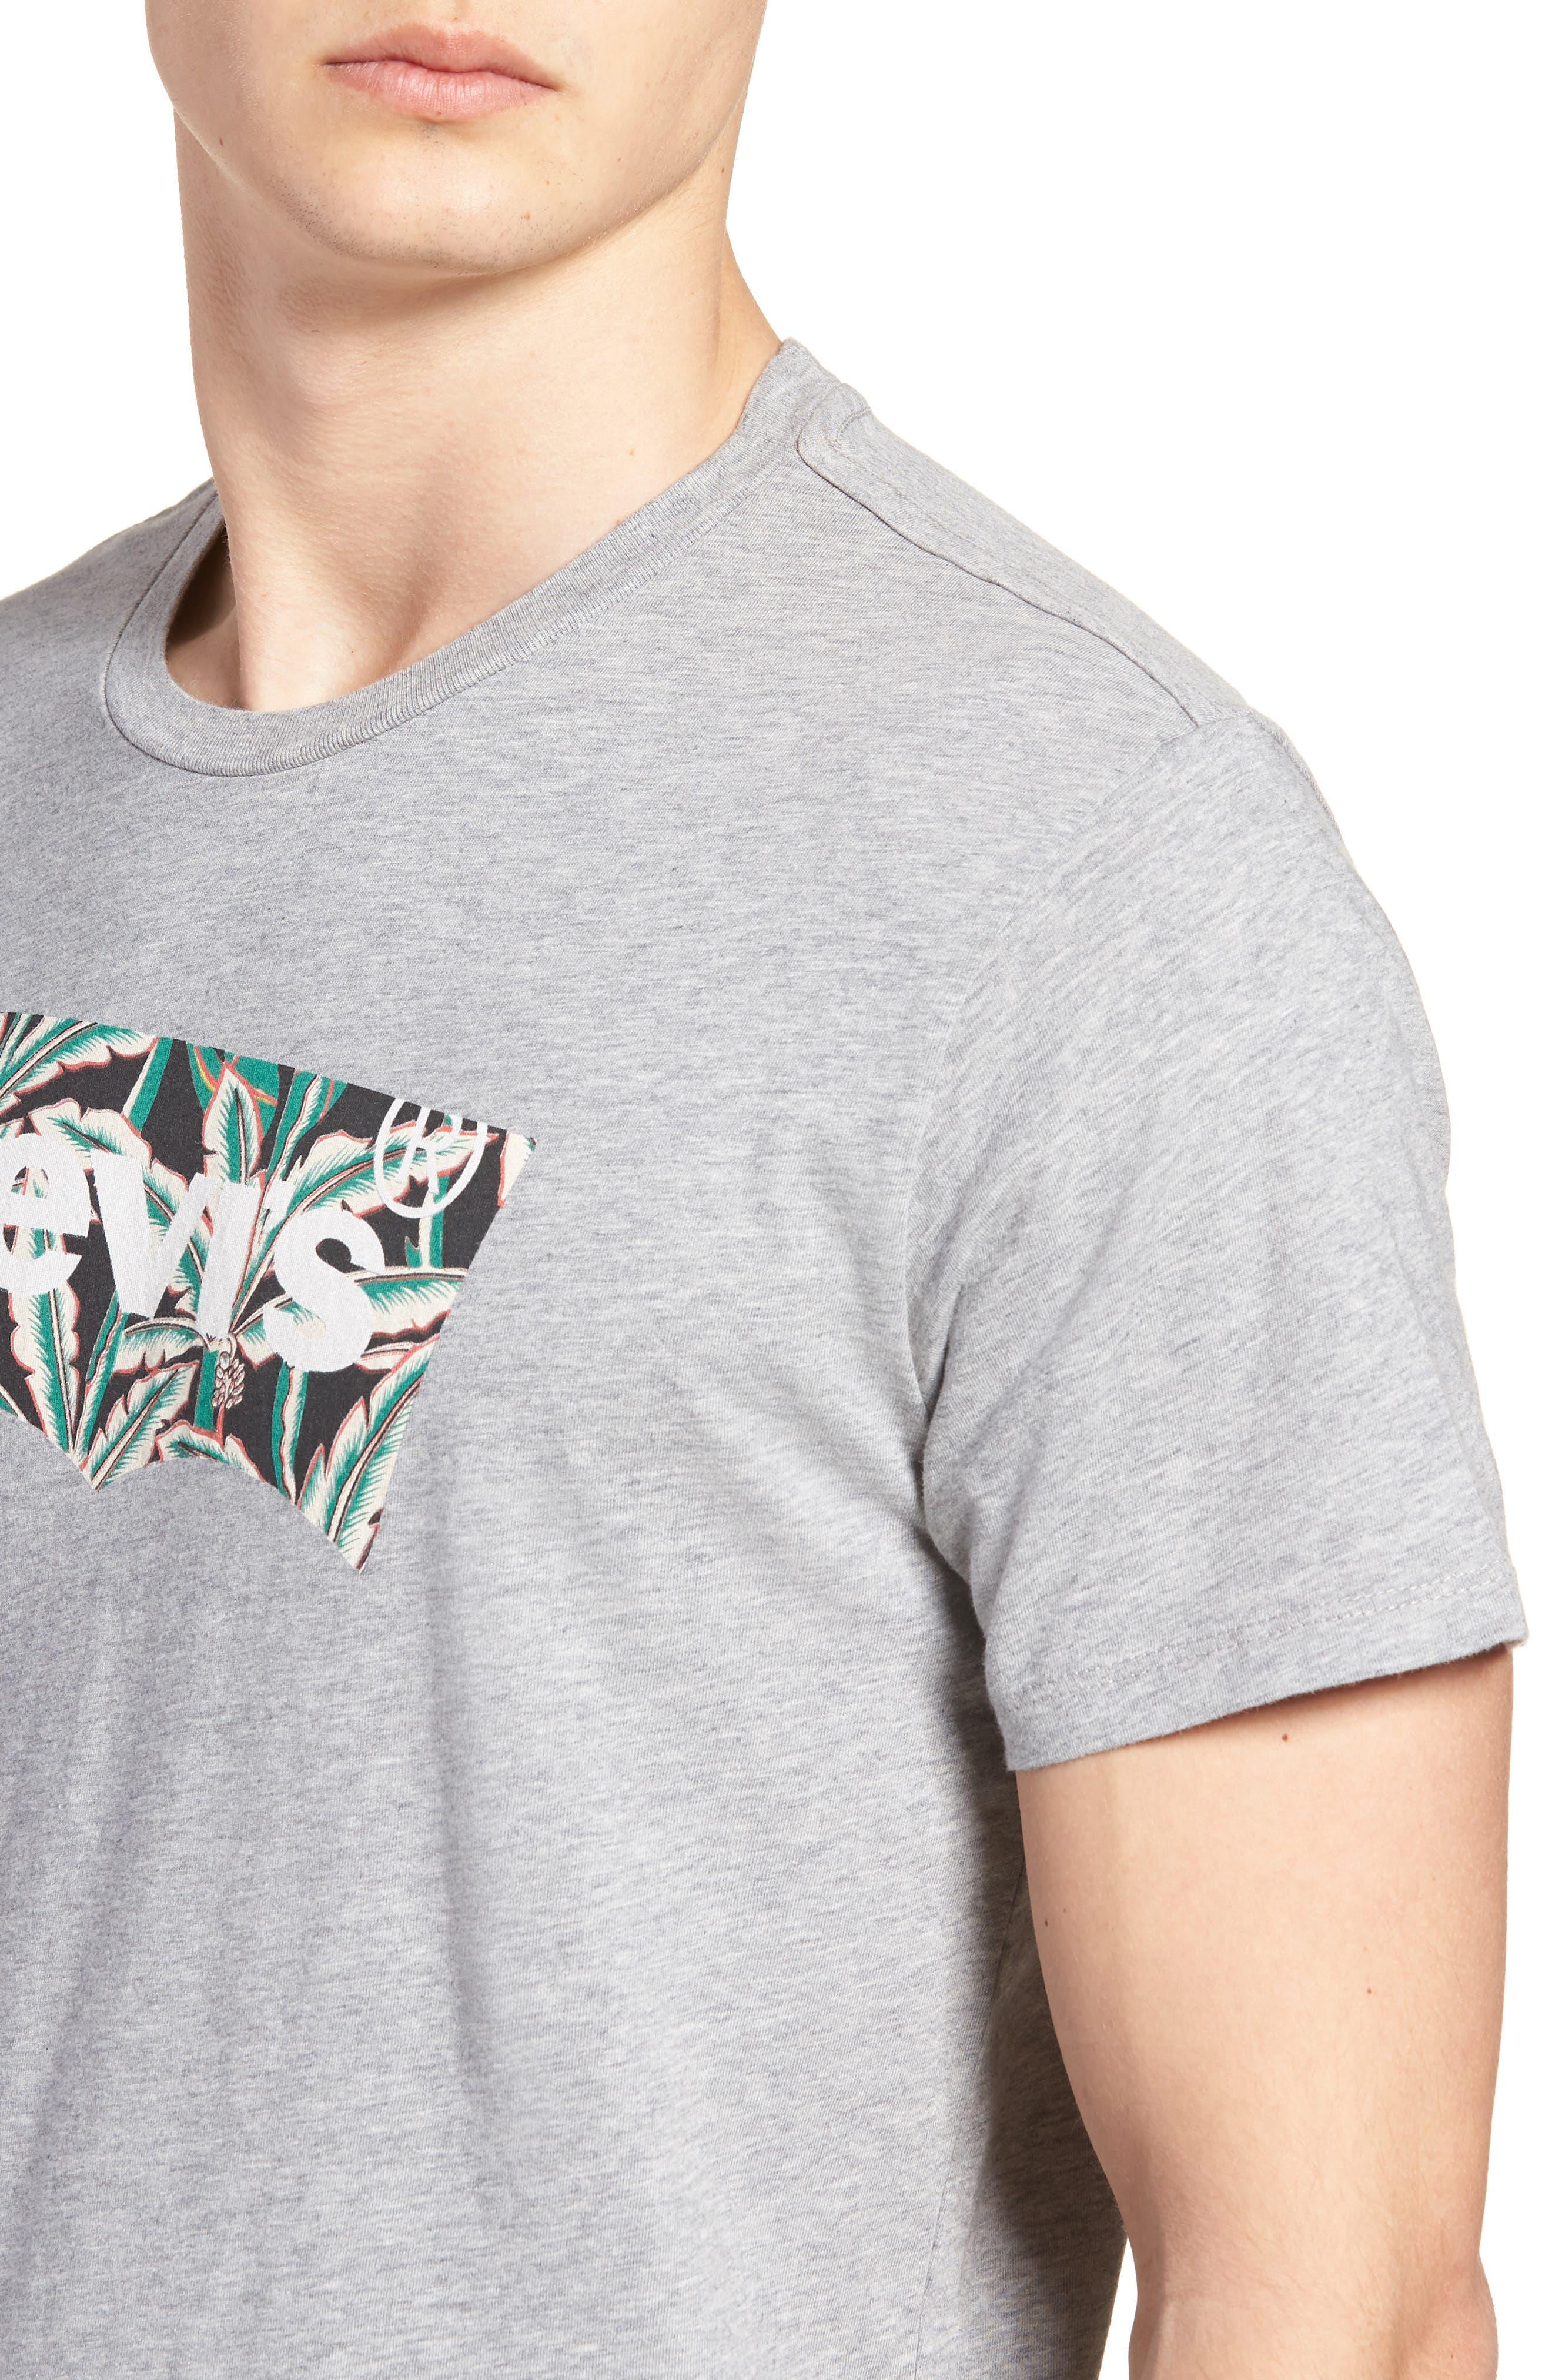 Housemark Graphic T-Shirt,                             Alternate thumbnail 4, color,                             020